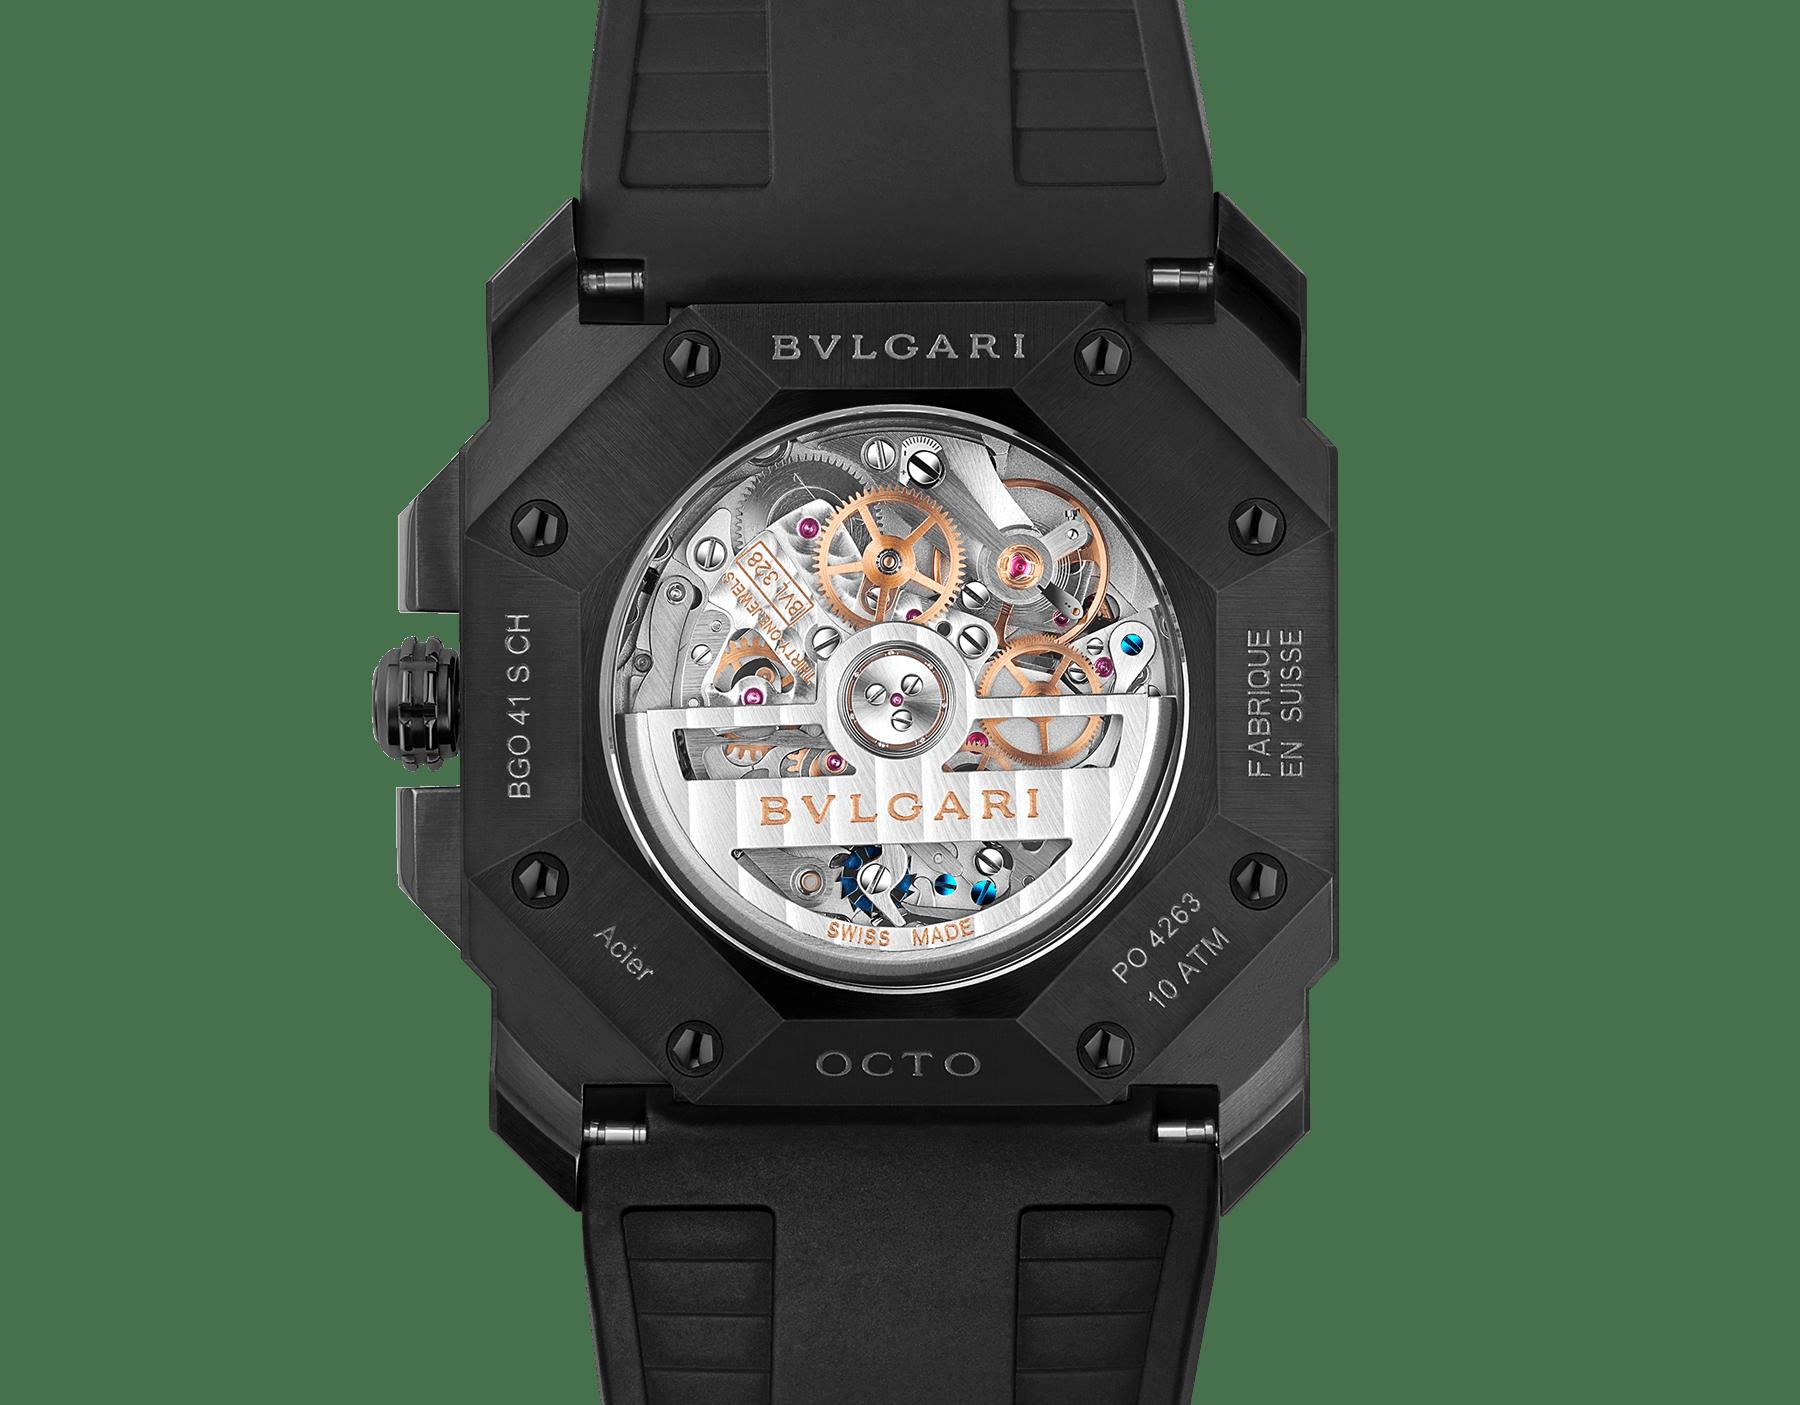 Octo L'Originale 腕錶,搭載機械機芯,整合式導柱輪高頻計時結構(5 赫茲),矽質擒縱結構,自動上鍊,日期顯示,精鋼錶殼飾以黑色 DLC 類鑽碳高耐磨鍍膜,灰色錶盤,黑色橡膠錶帶。 103027 image 4